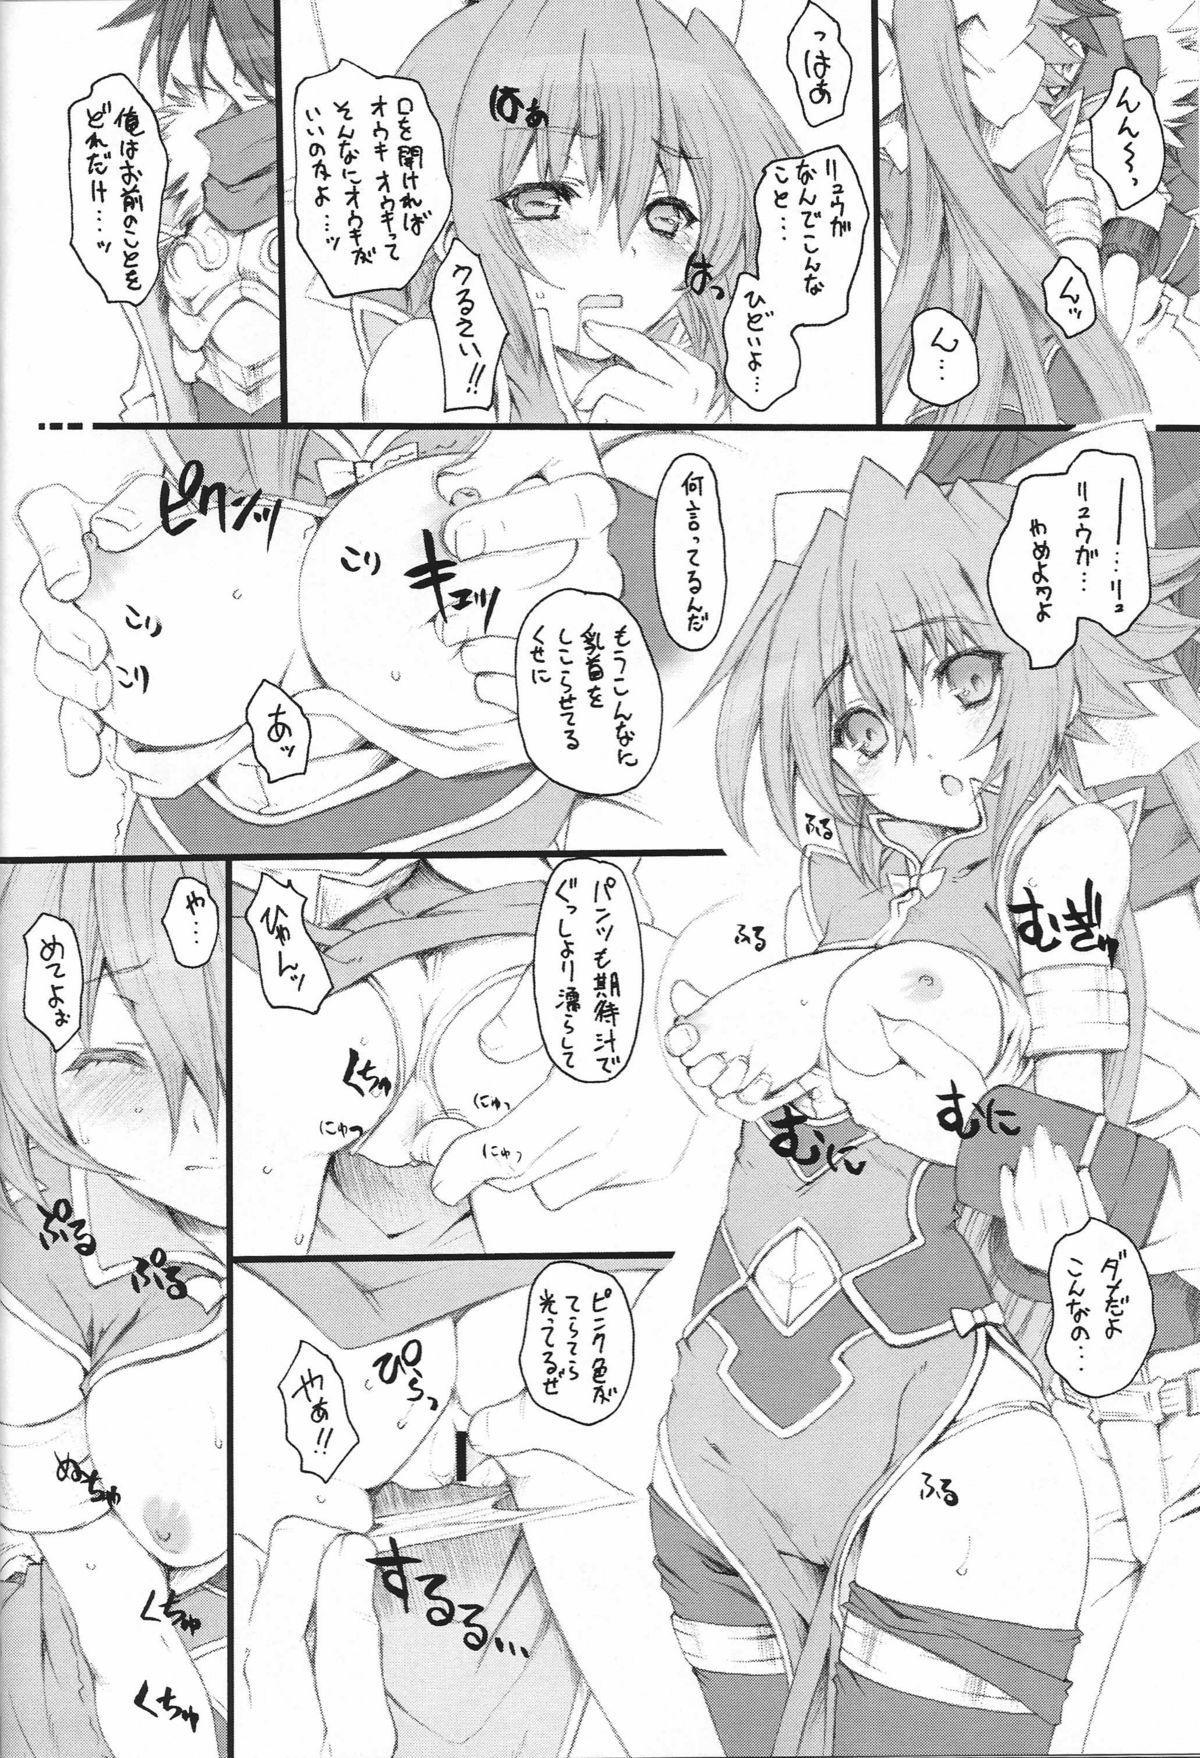 (C72) [Uguisuya (Uguisu Kagura)] Hammer of the Cat Year Type-S - S-Gata Nukomimi Hammer (Shinrabanshou Chocolate) 2